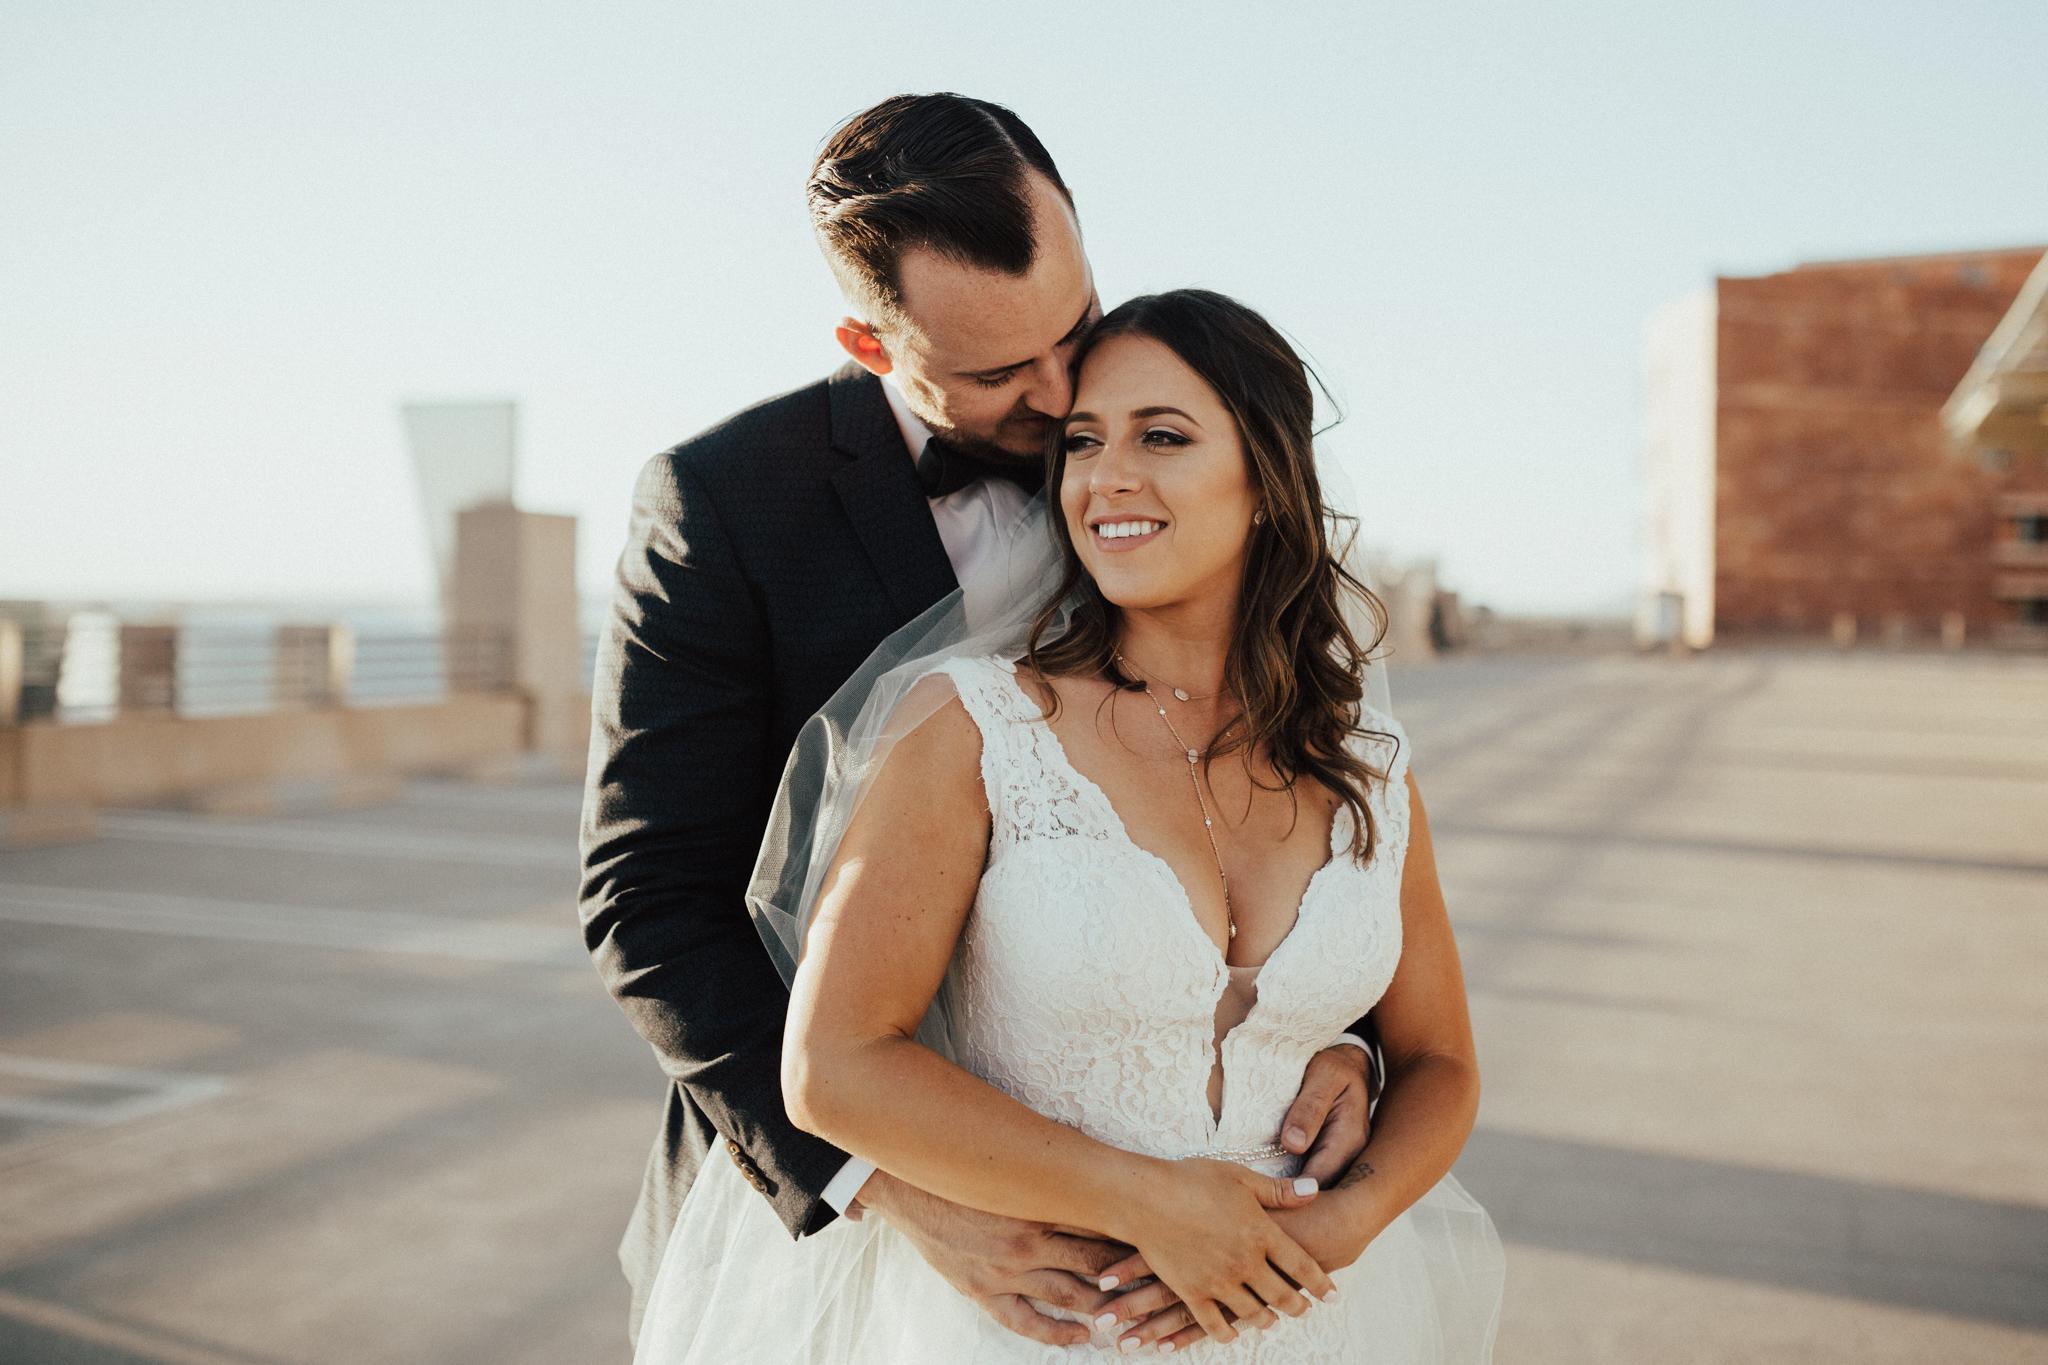 Arizona-Adventure-Elopement-Wedding-Photographer-13.jpg